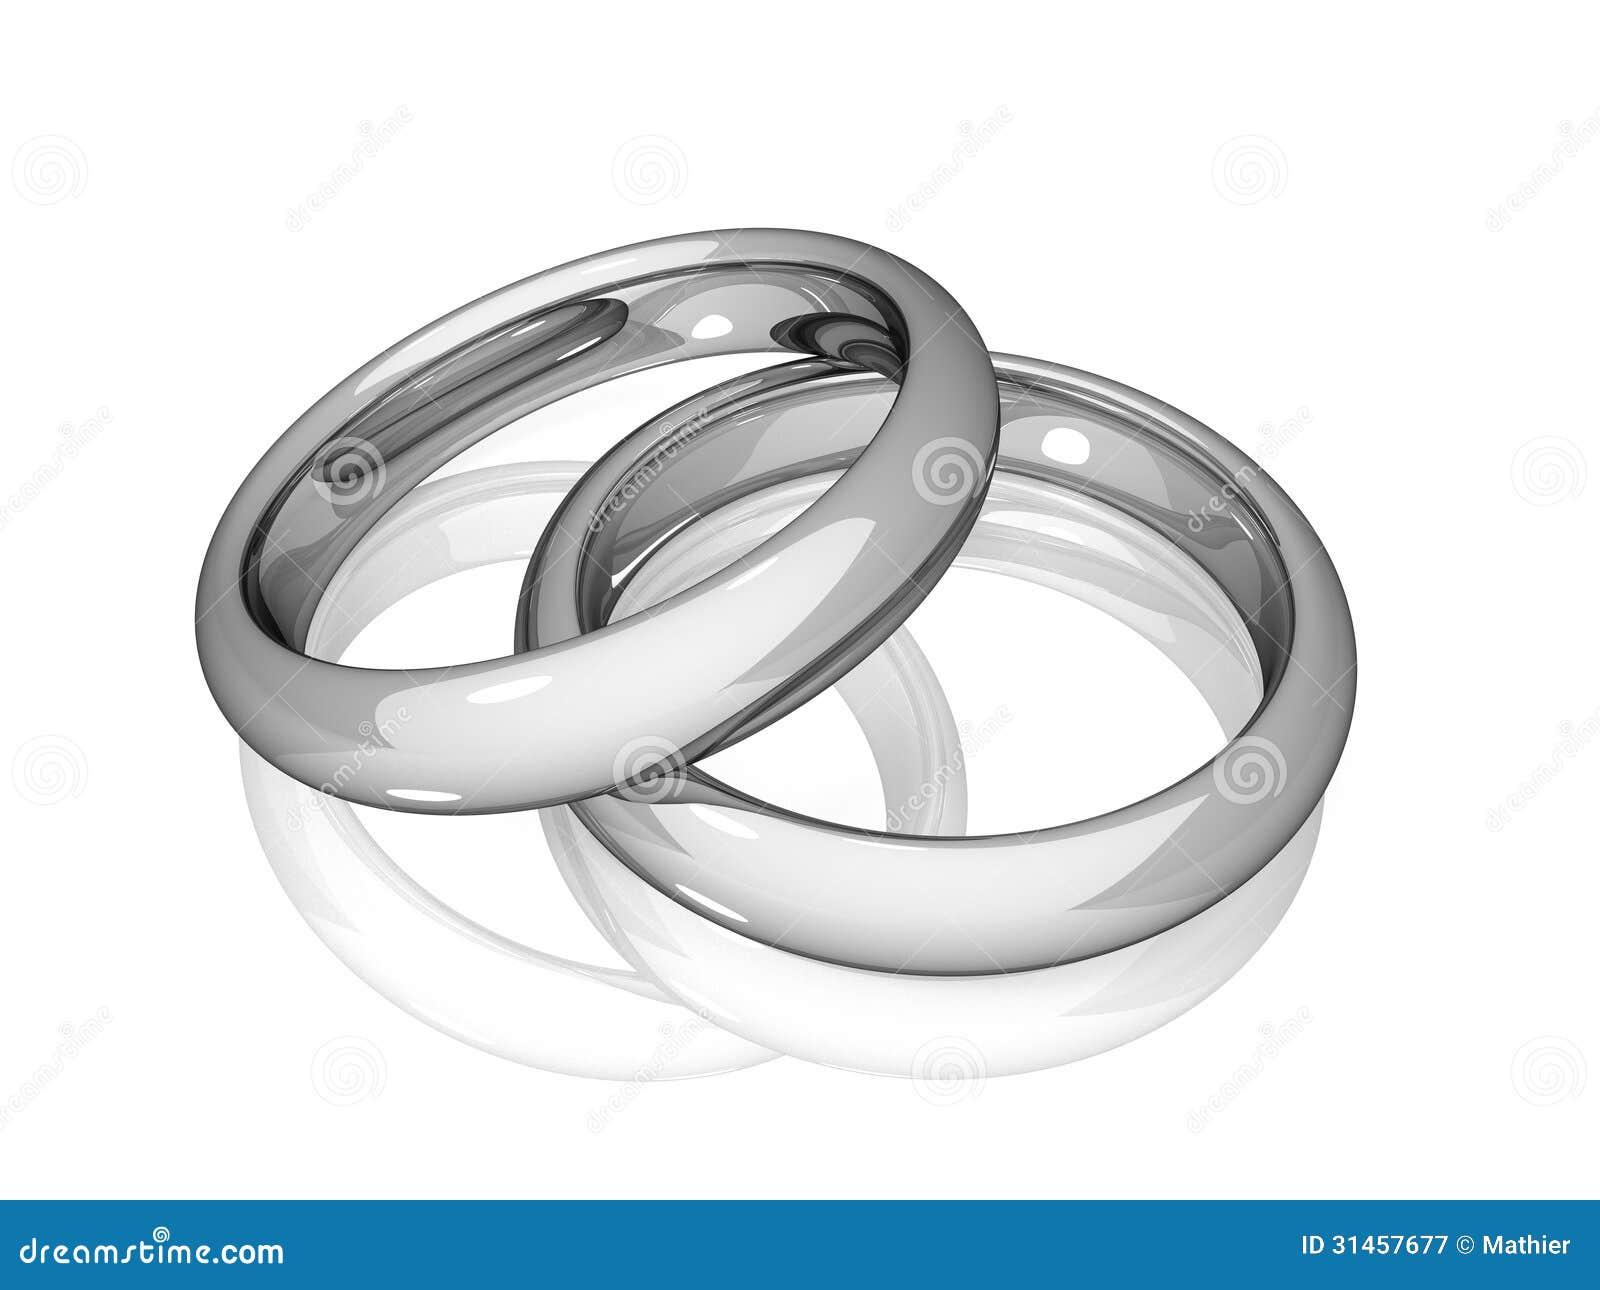 Heirat - Weiße Goldene Ringe Lizenzfreie Stockfotografie - Bild ...